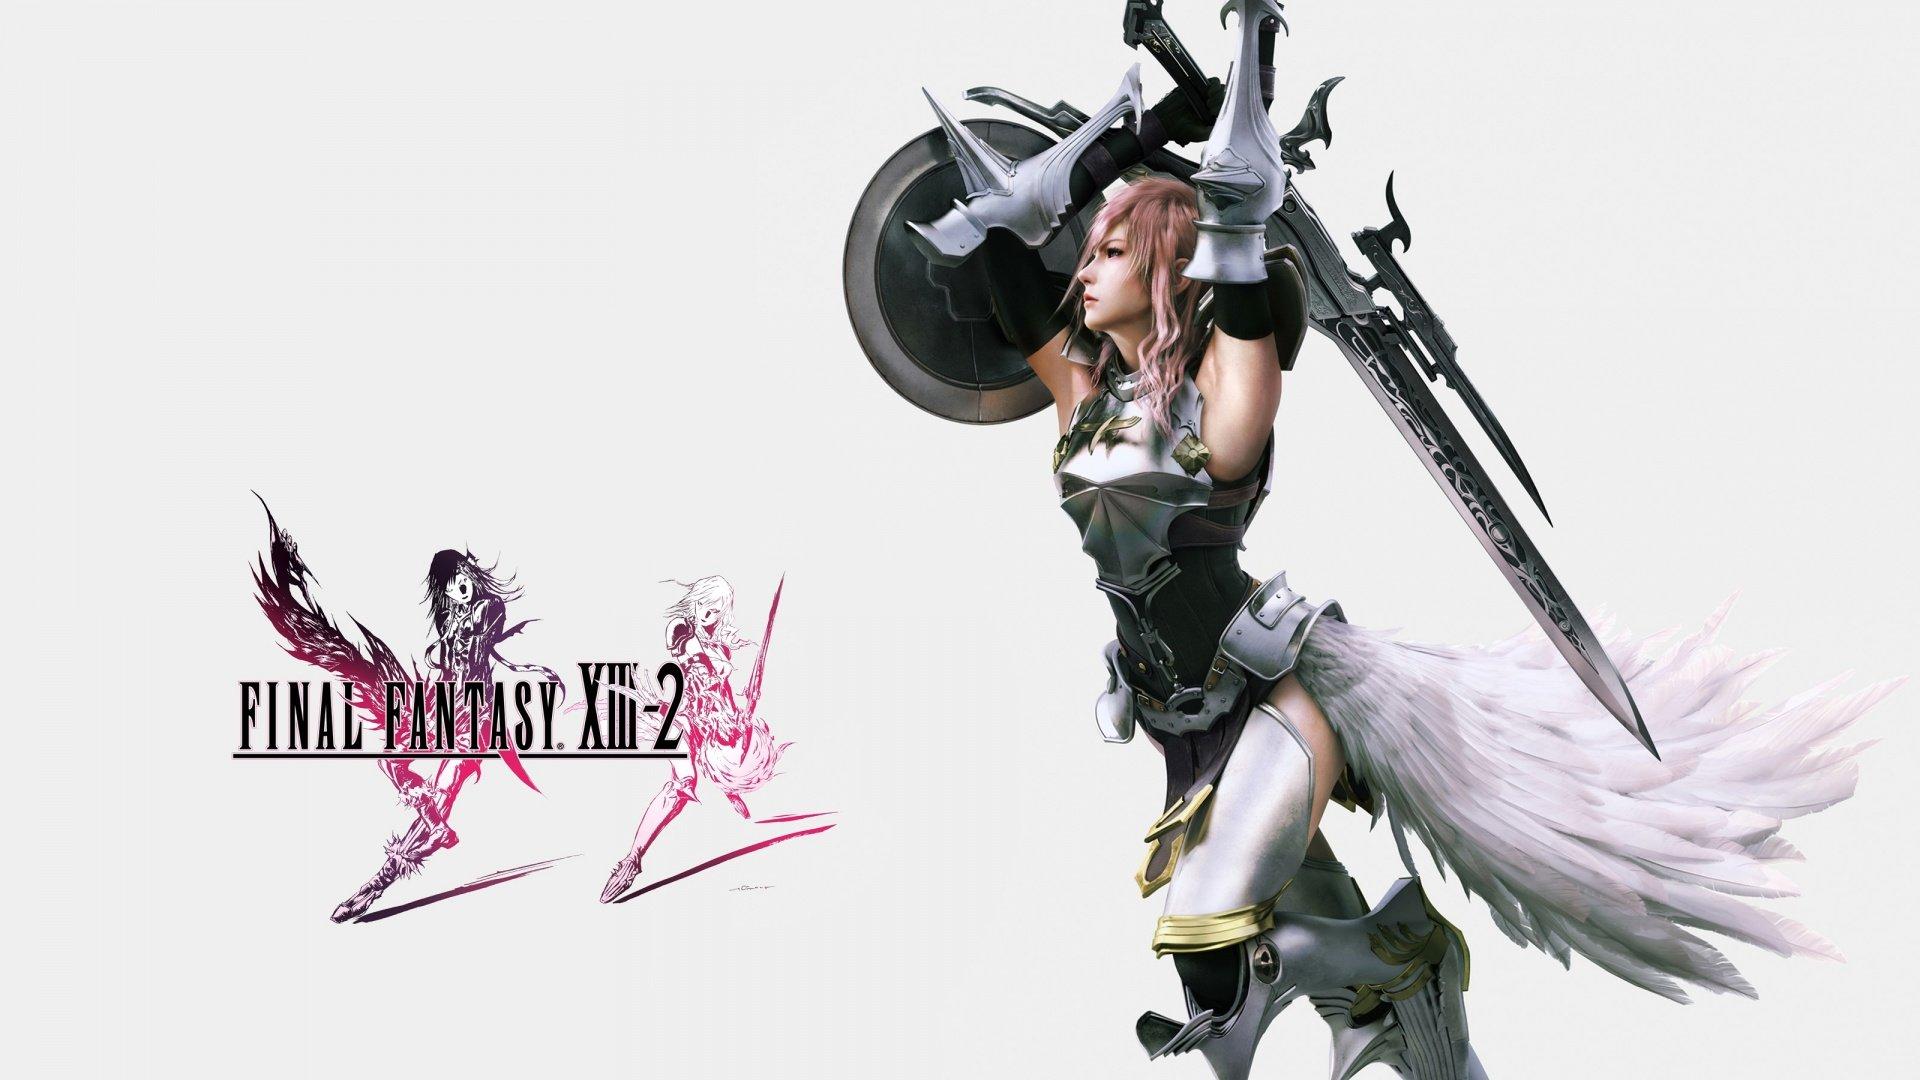 Final Fantasy Xiii 2 Pc Download Skidrow idea gallery